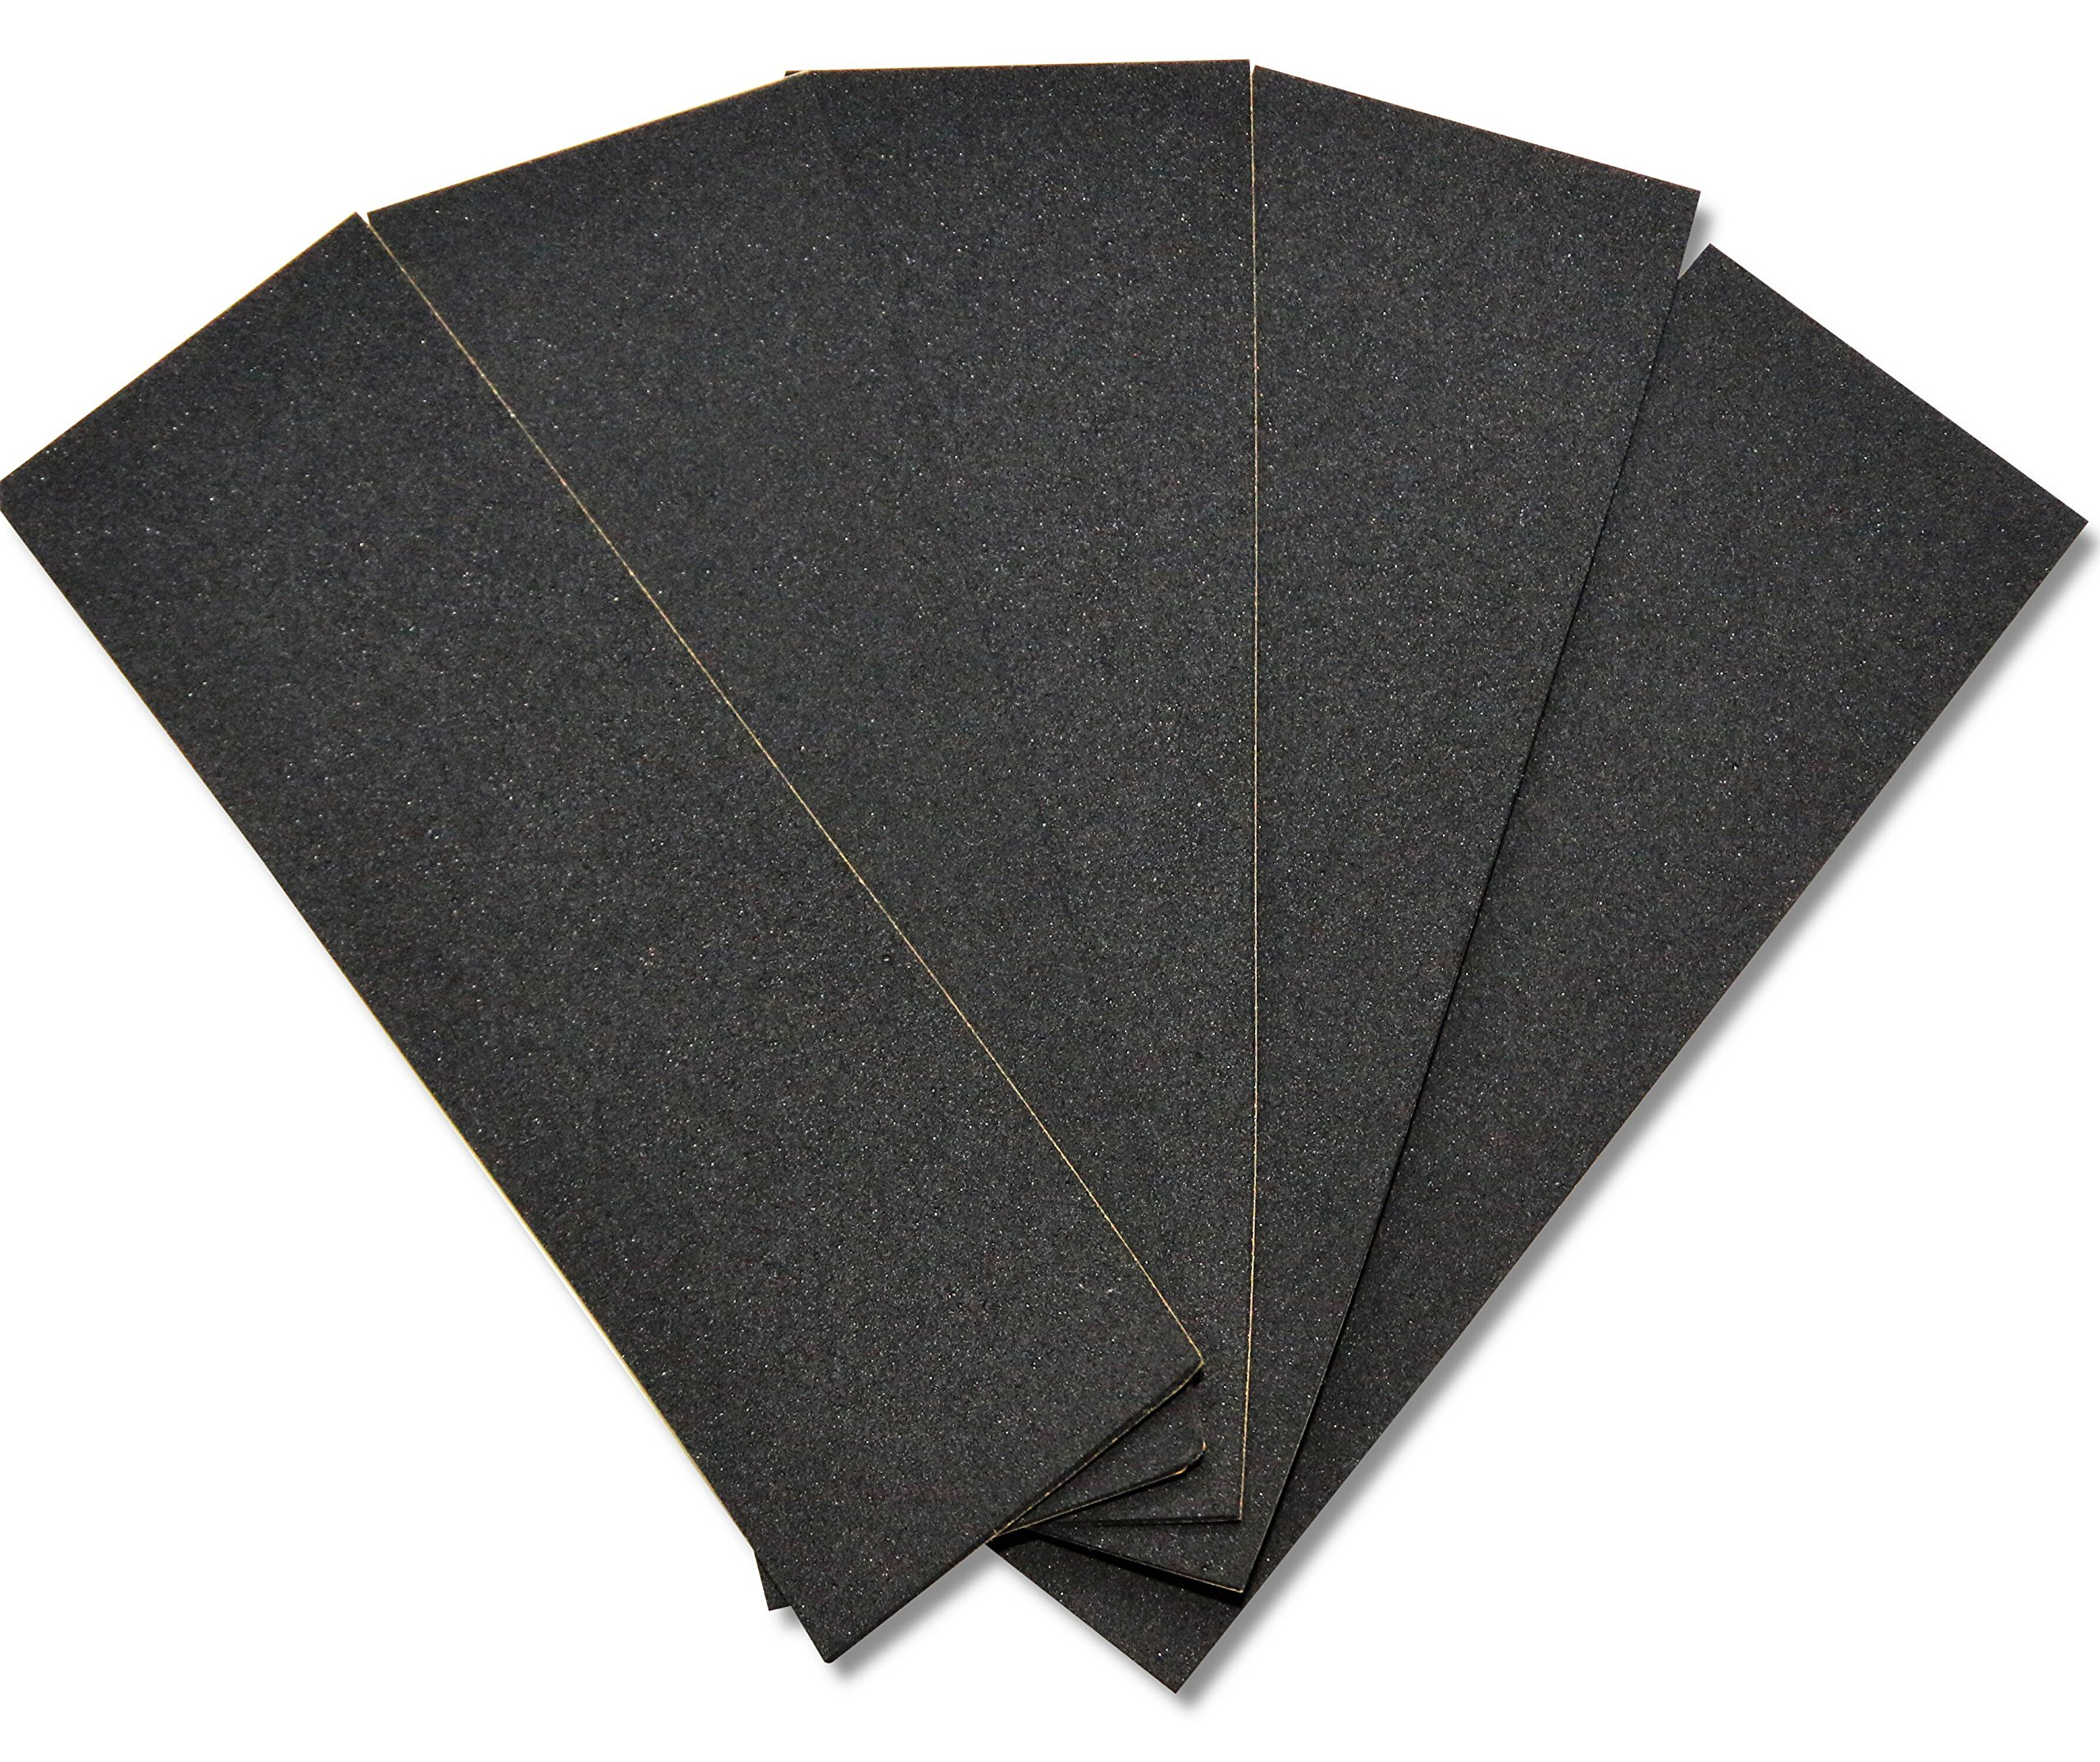 Teak Tuning Premium Teak Tape, Fingerboard Foam Tape, Black (Pack of 5 Sheets)